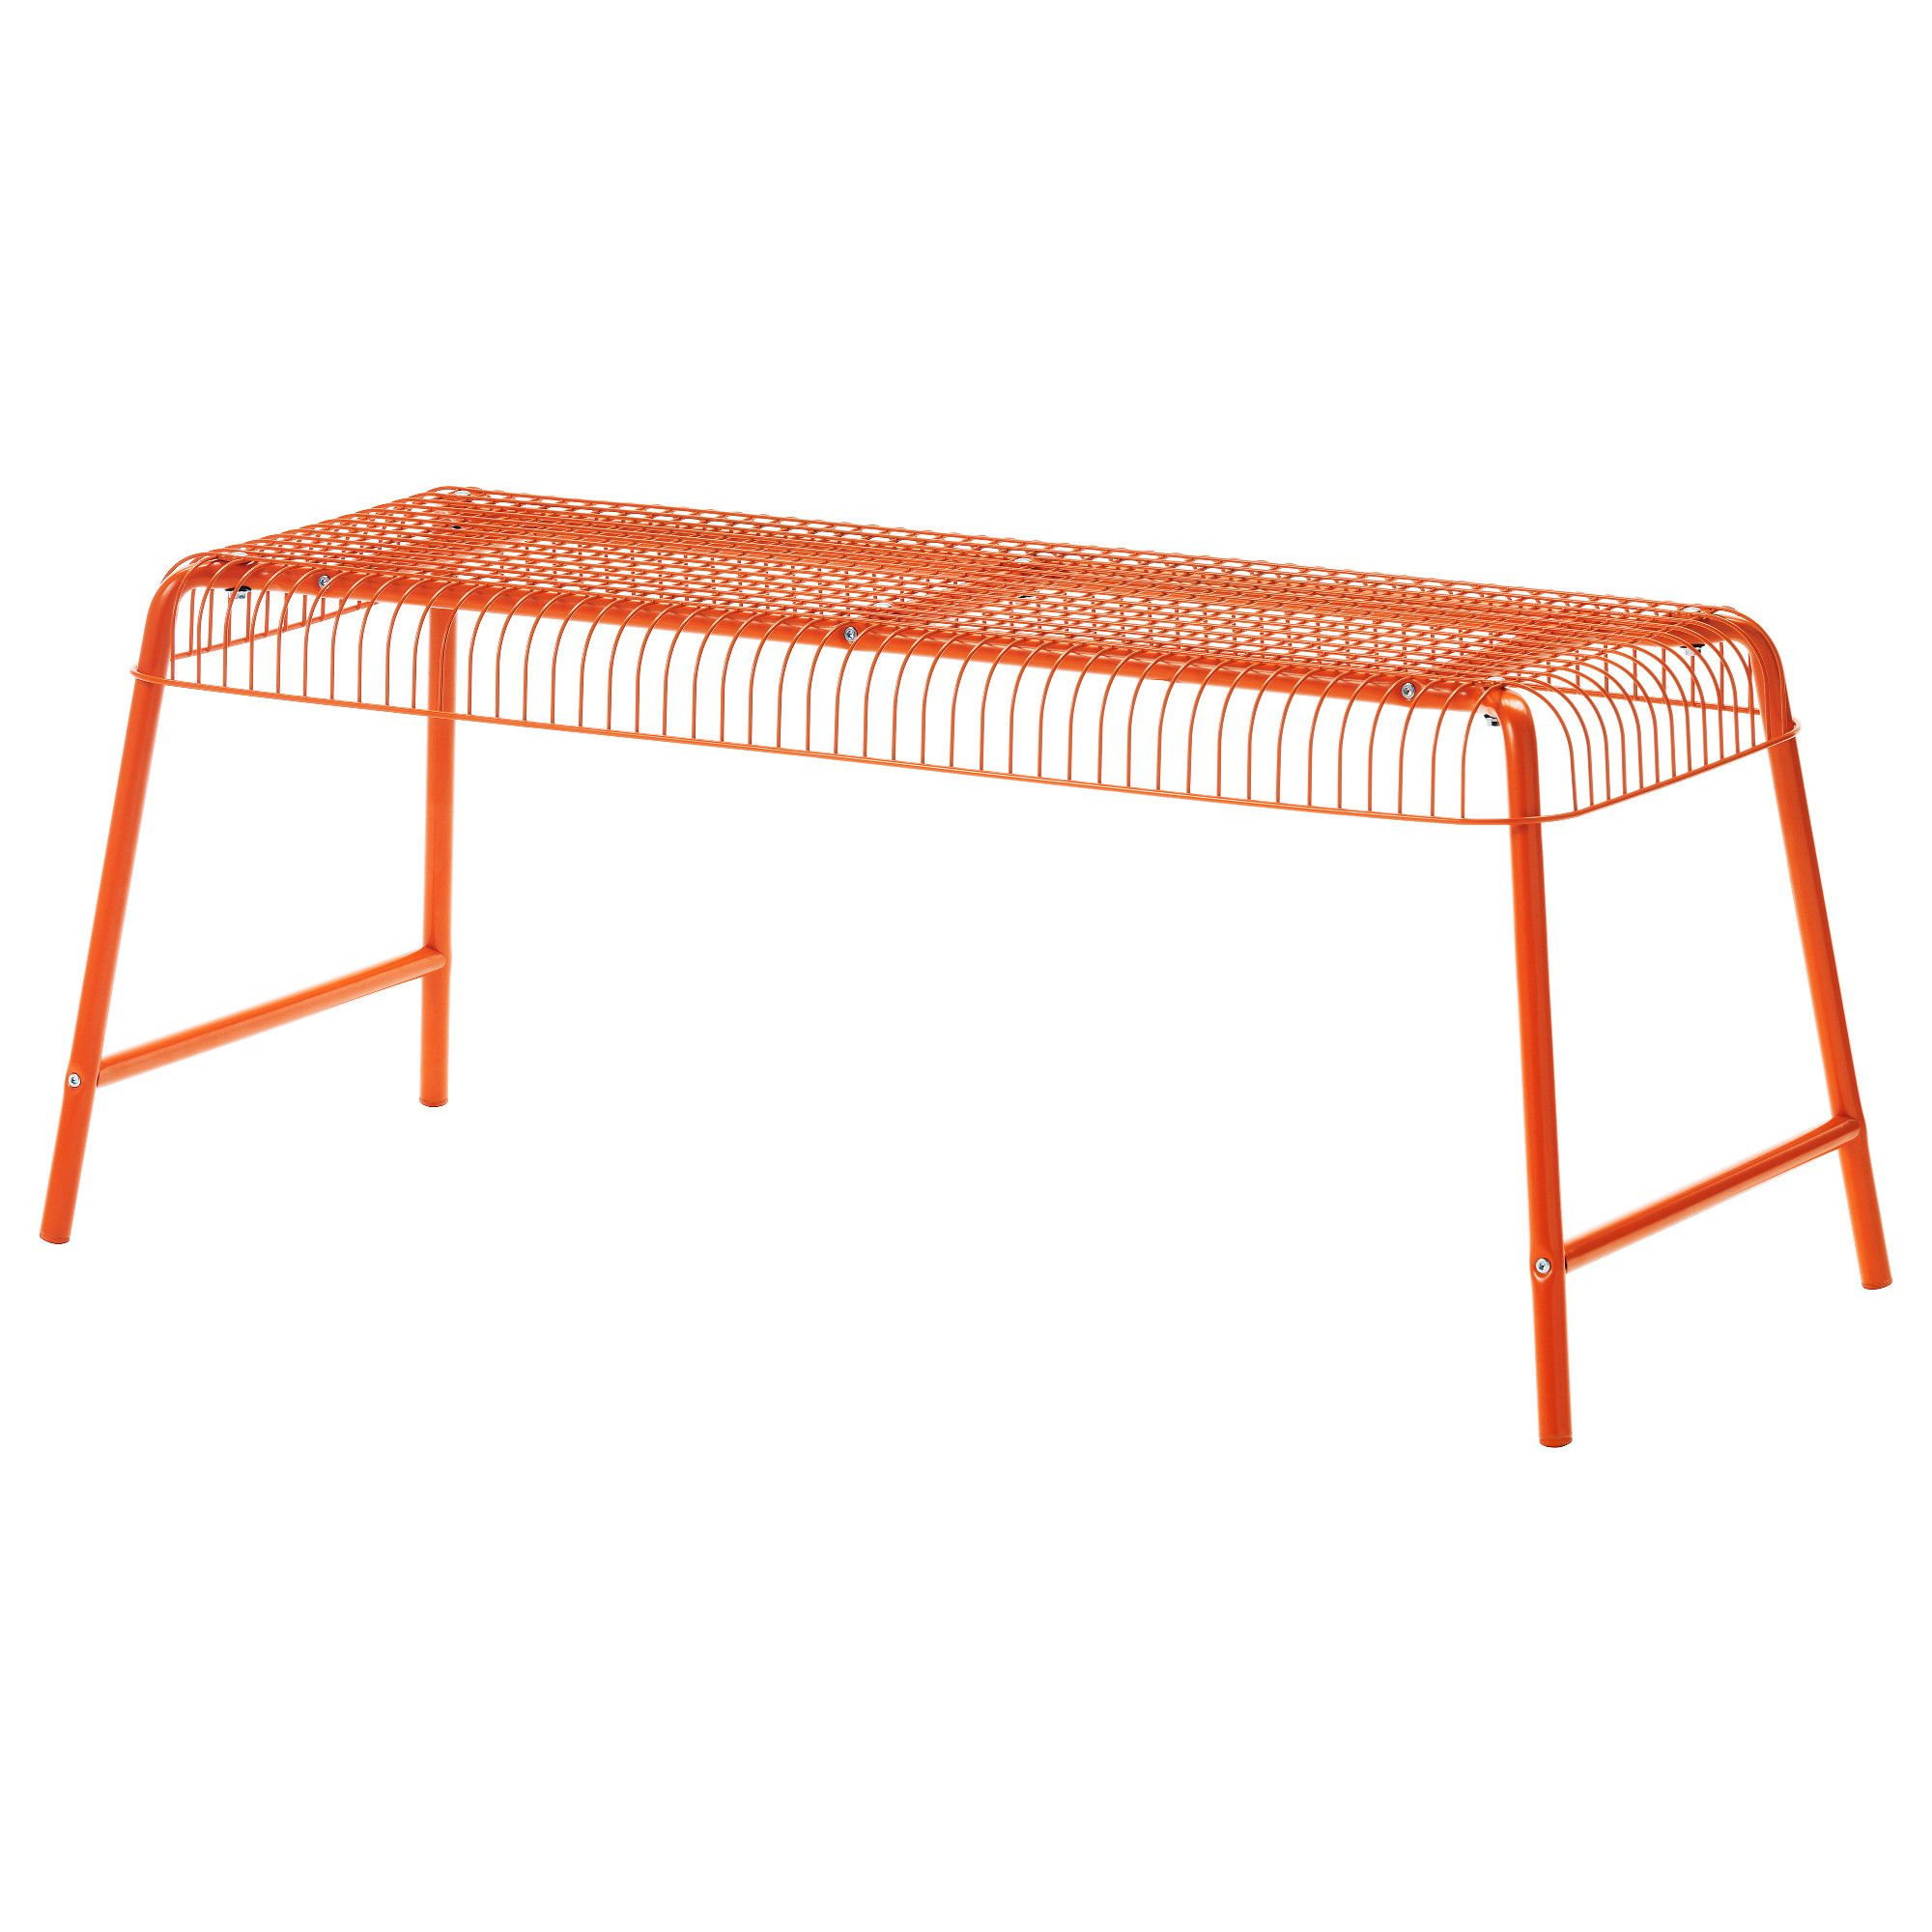 "V""STER–N Bench in outdoor orange"